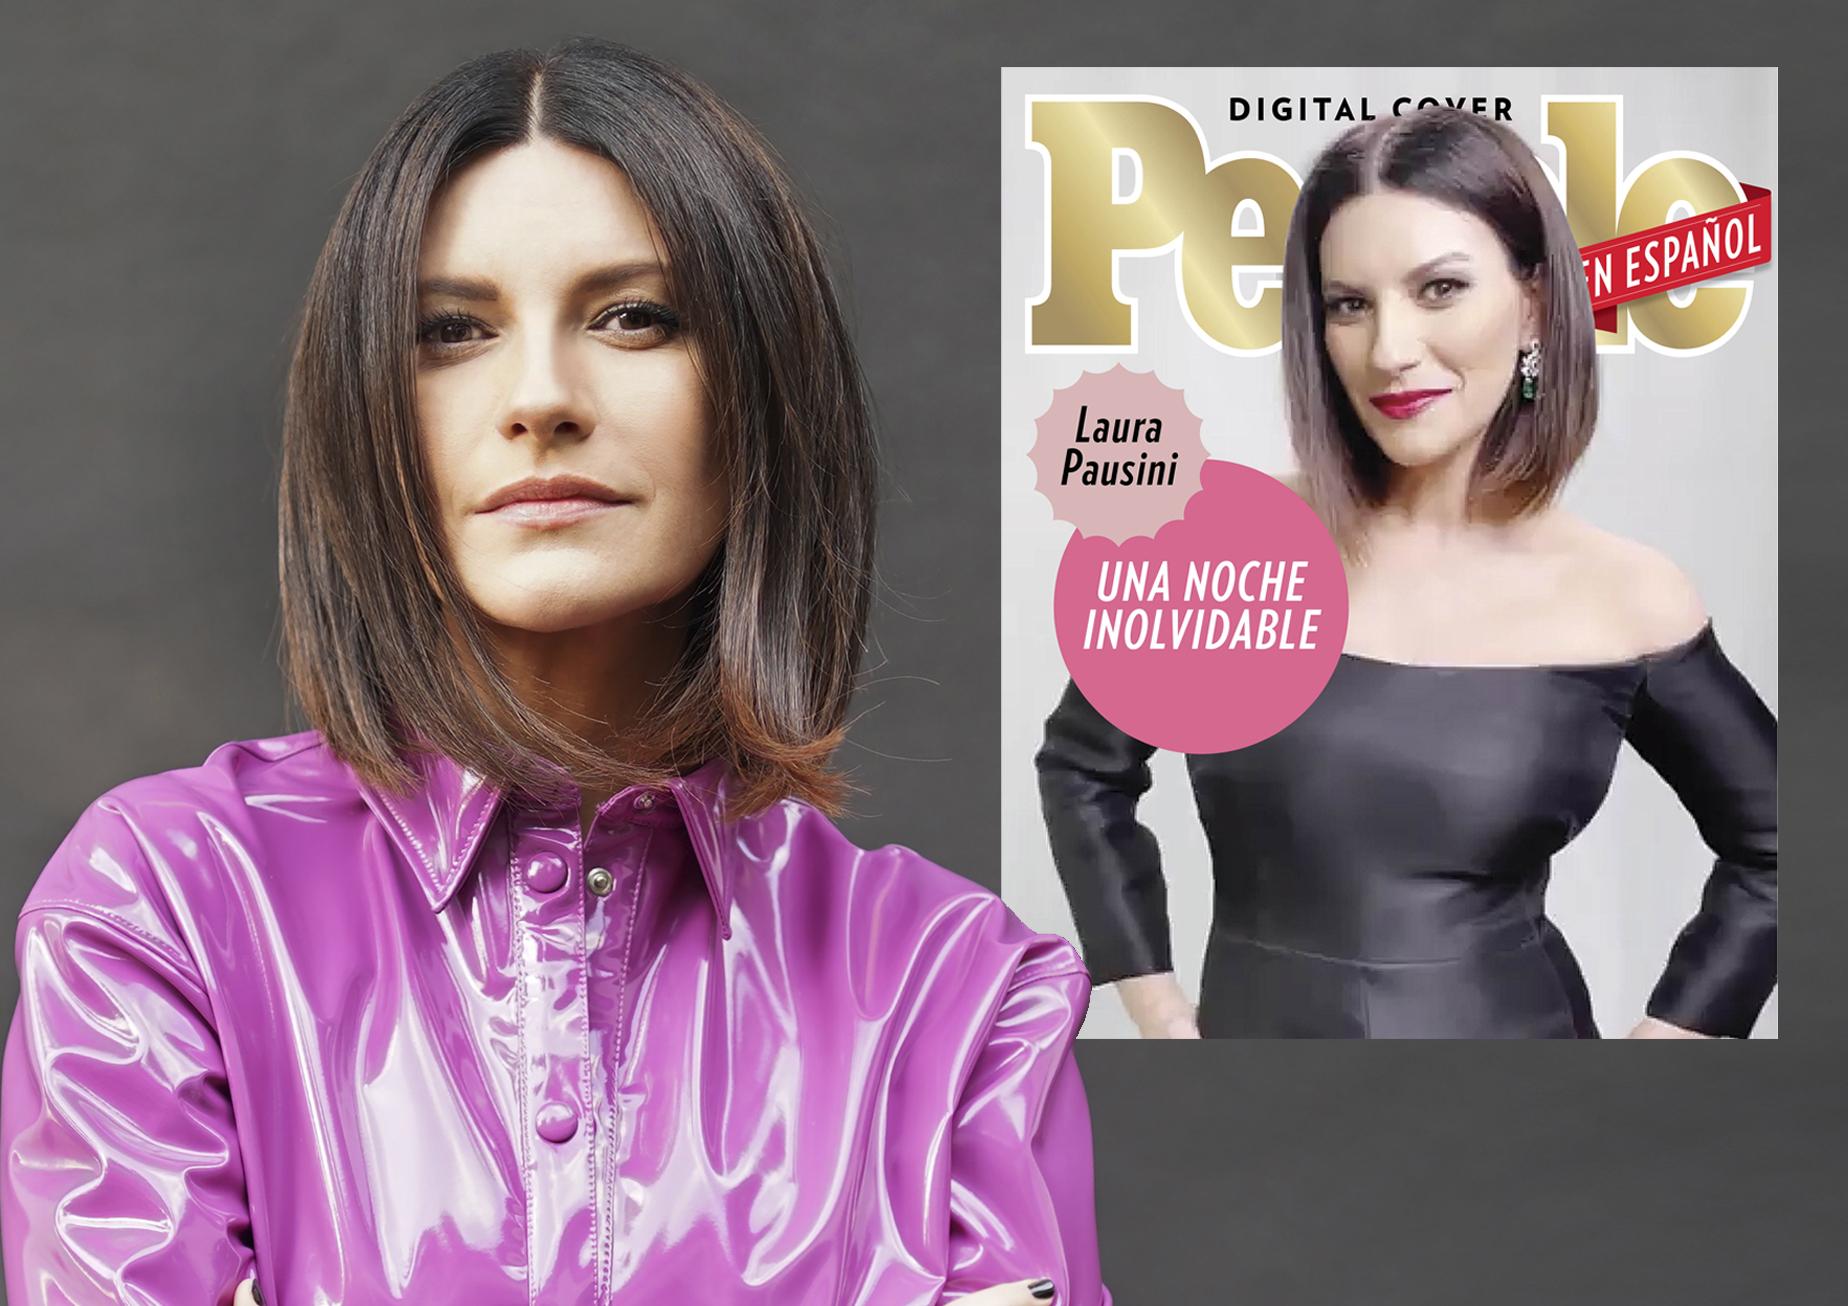 Laura Pausini Digital Cover